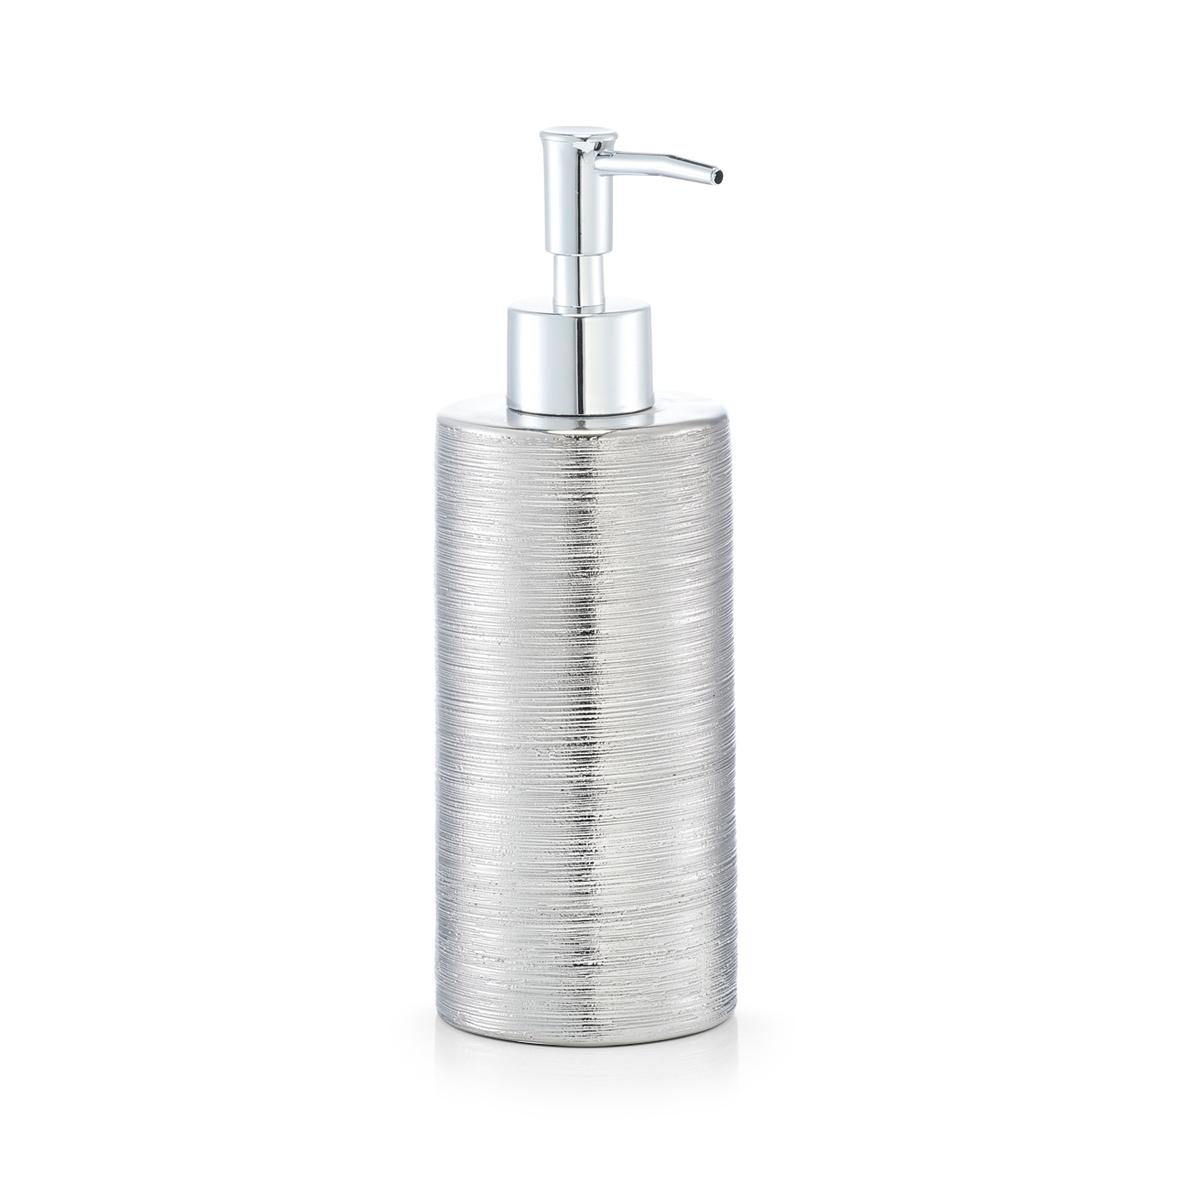 Dozator pentru sapun din ceramica, Brushed Silver, Ø 6,7xH19,5 cm imagine